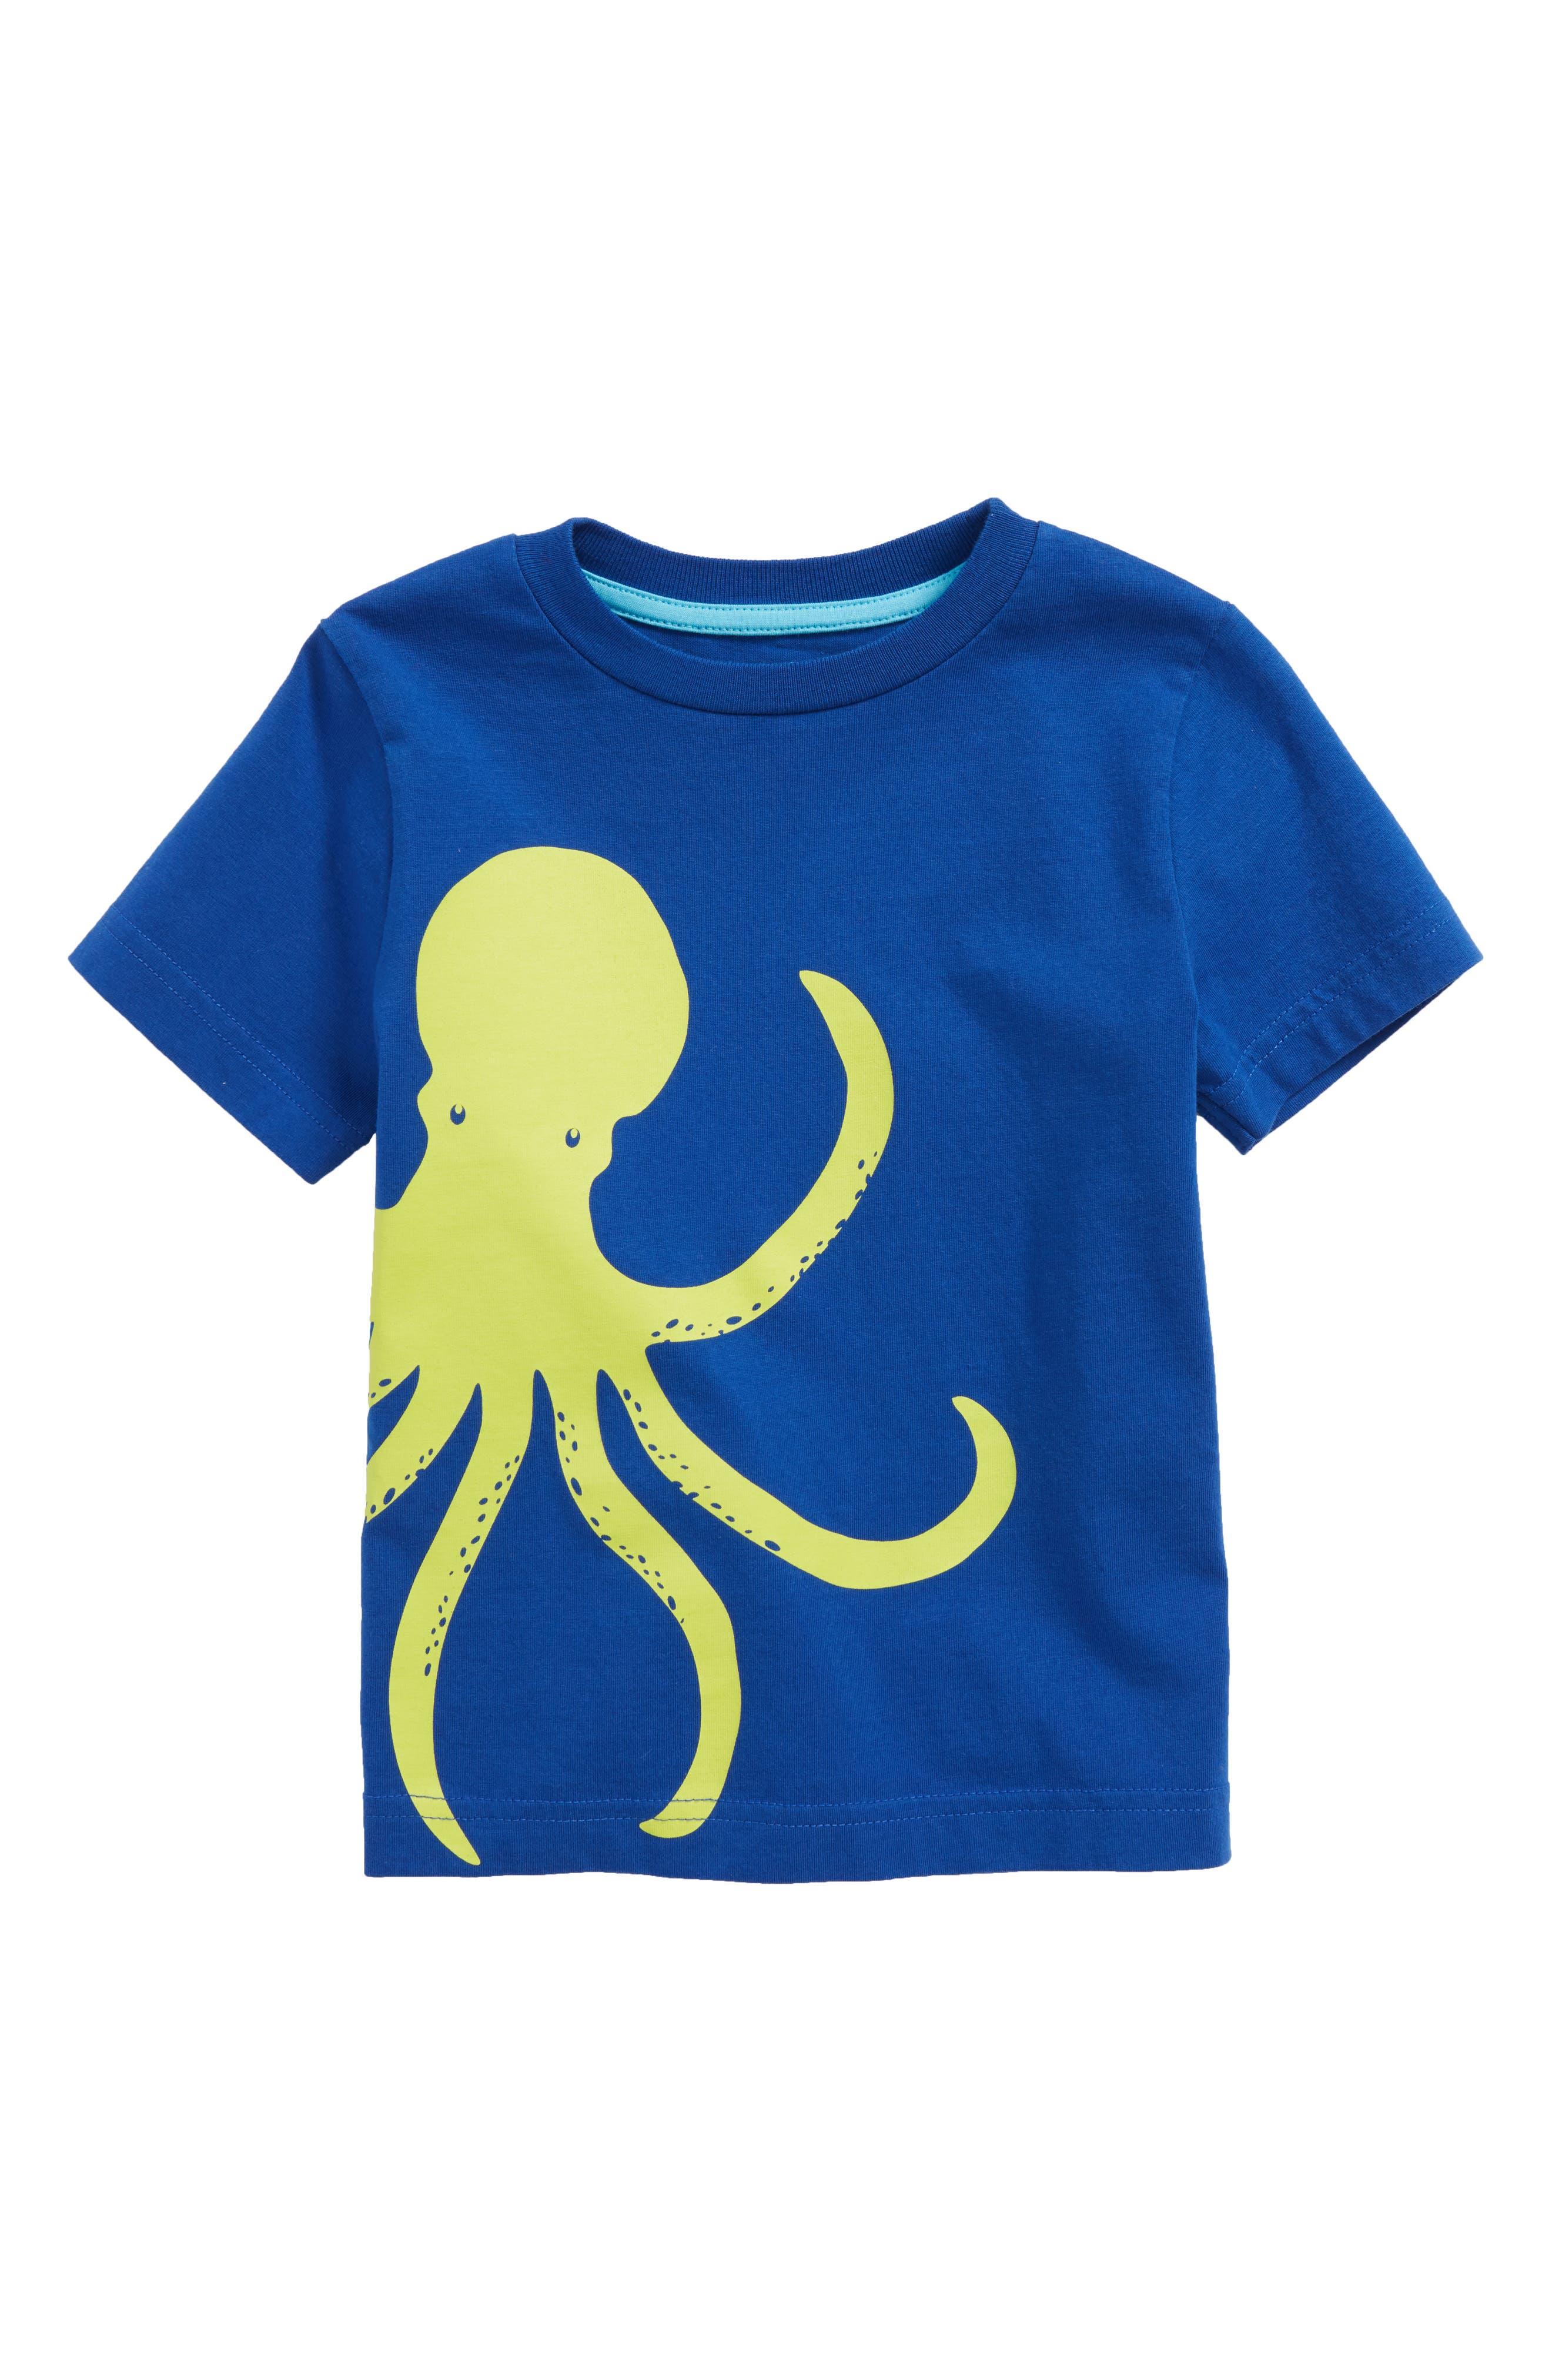 Wraparound Octopus T-Shirt,                             Main thumbnail 1, color,                             Orion Blue Octopus